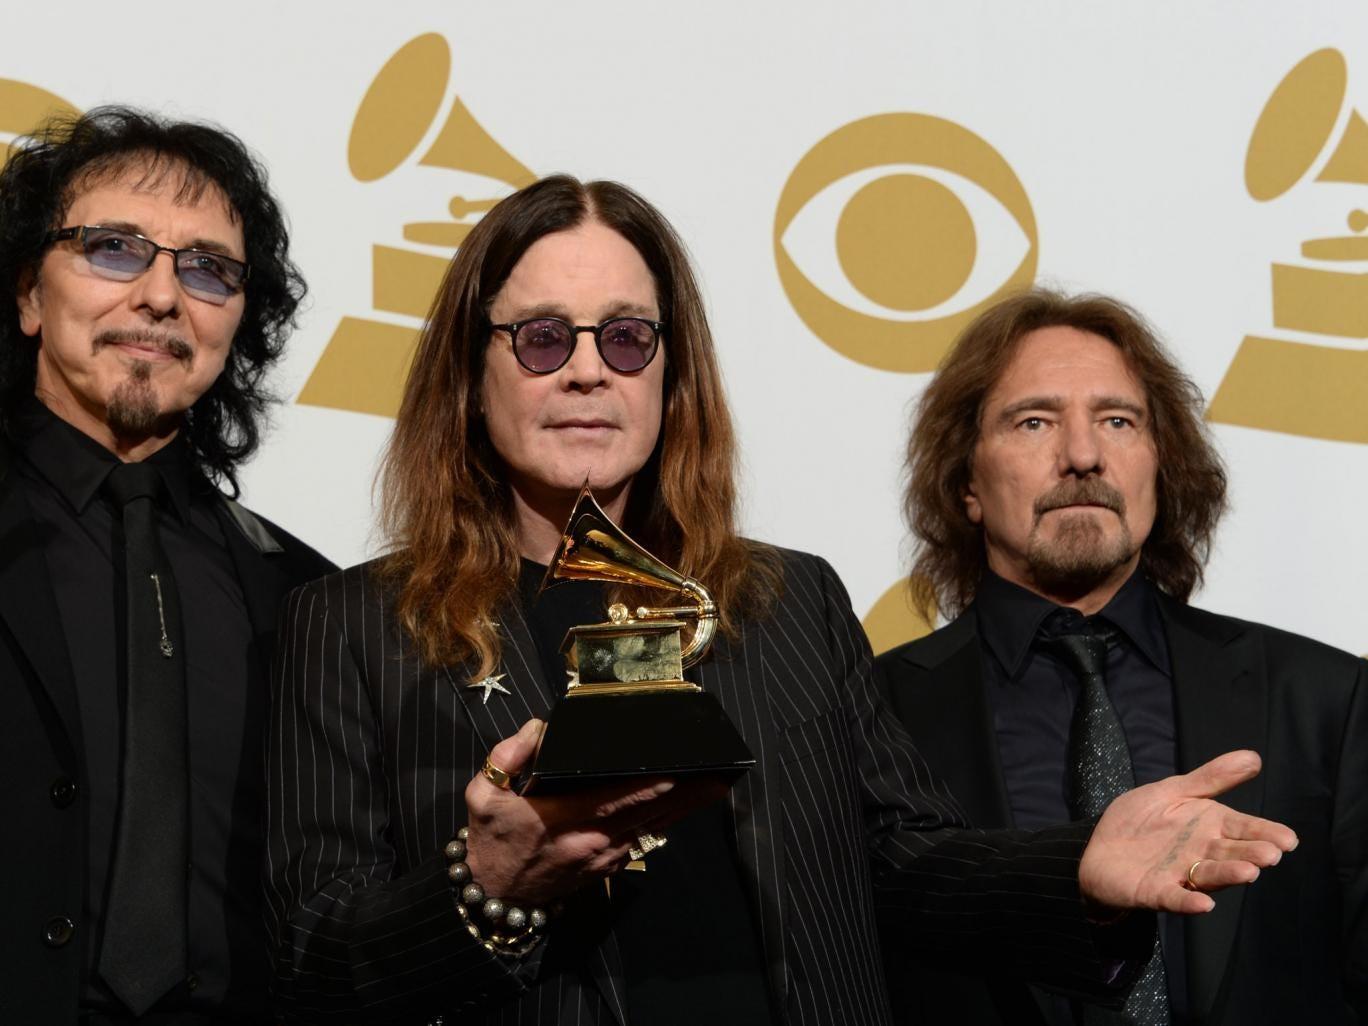 Ozzy Osborne with Black Sabbath's Grammy Award for Hard Rock/Metal Performance with God Is Dead